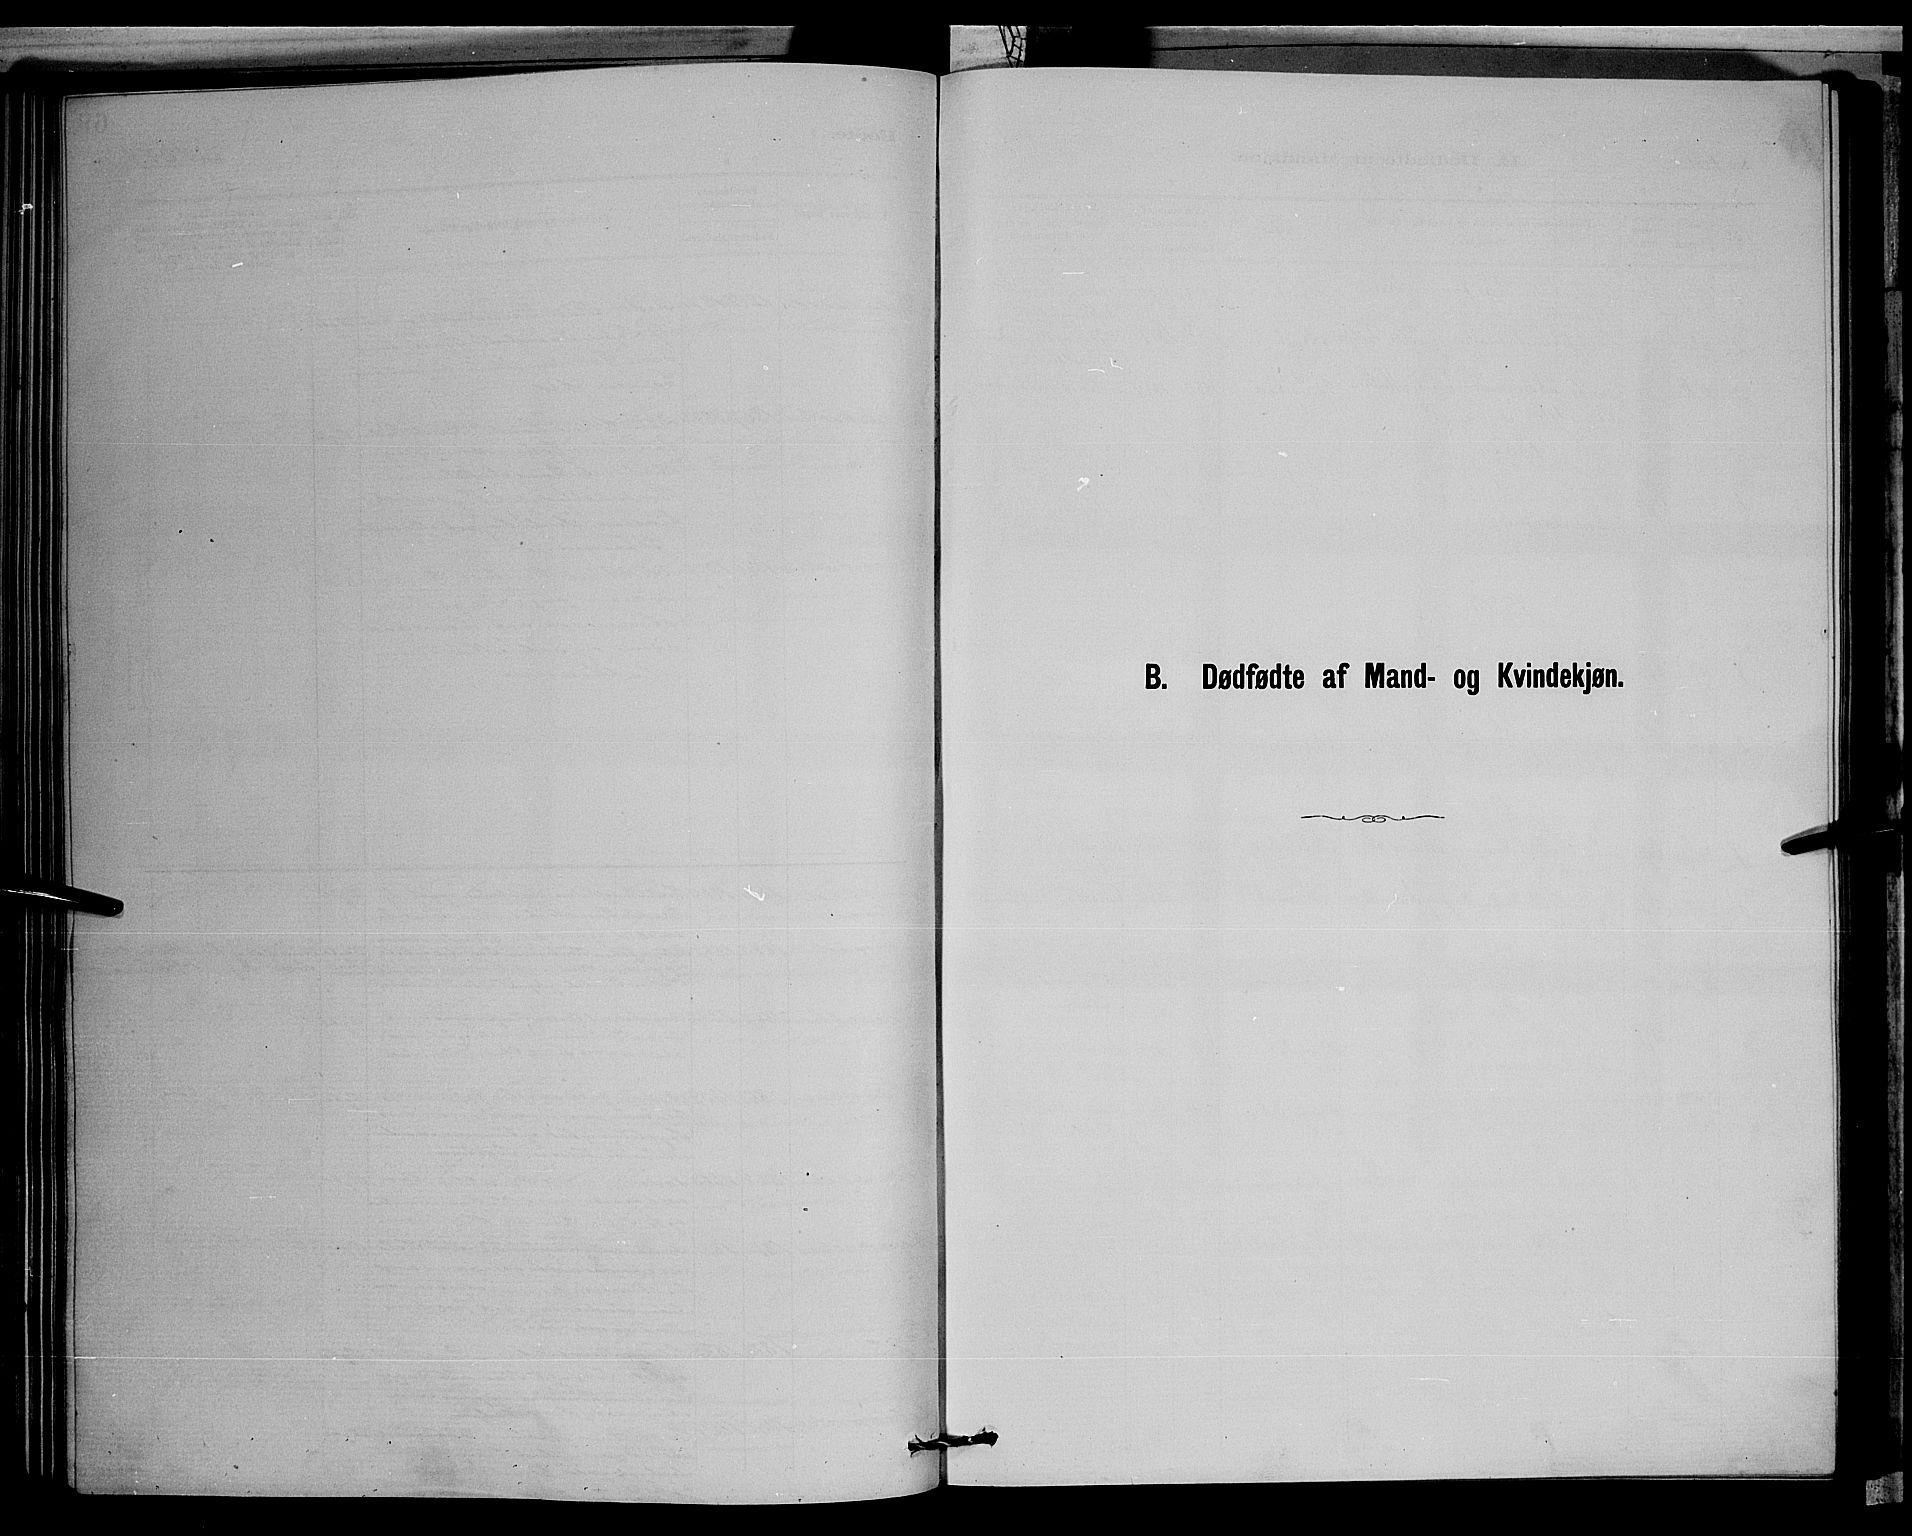 SAH, Vardal prestekontor, H/Ha/Hab/L0008: Klokkerbok nr. 8, 1881-1898